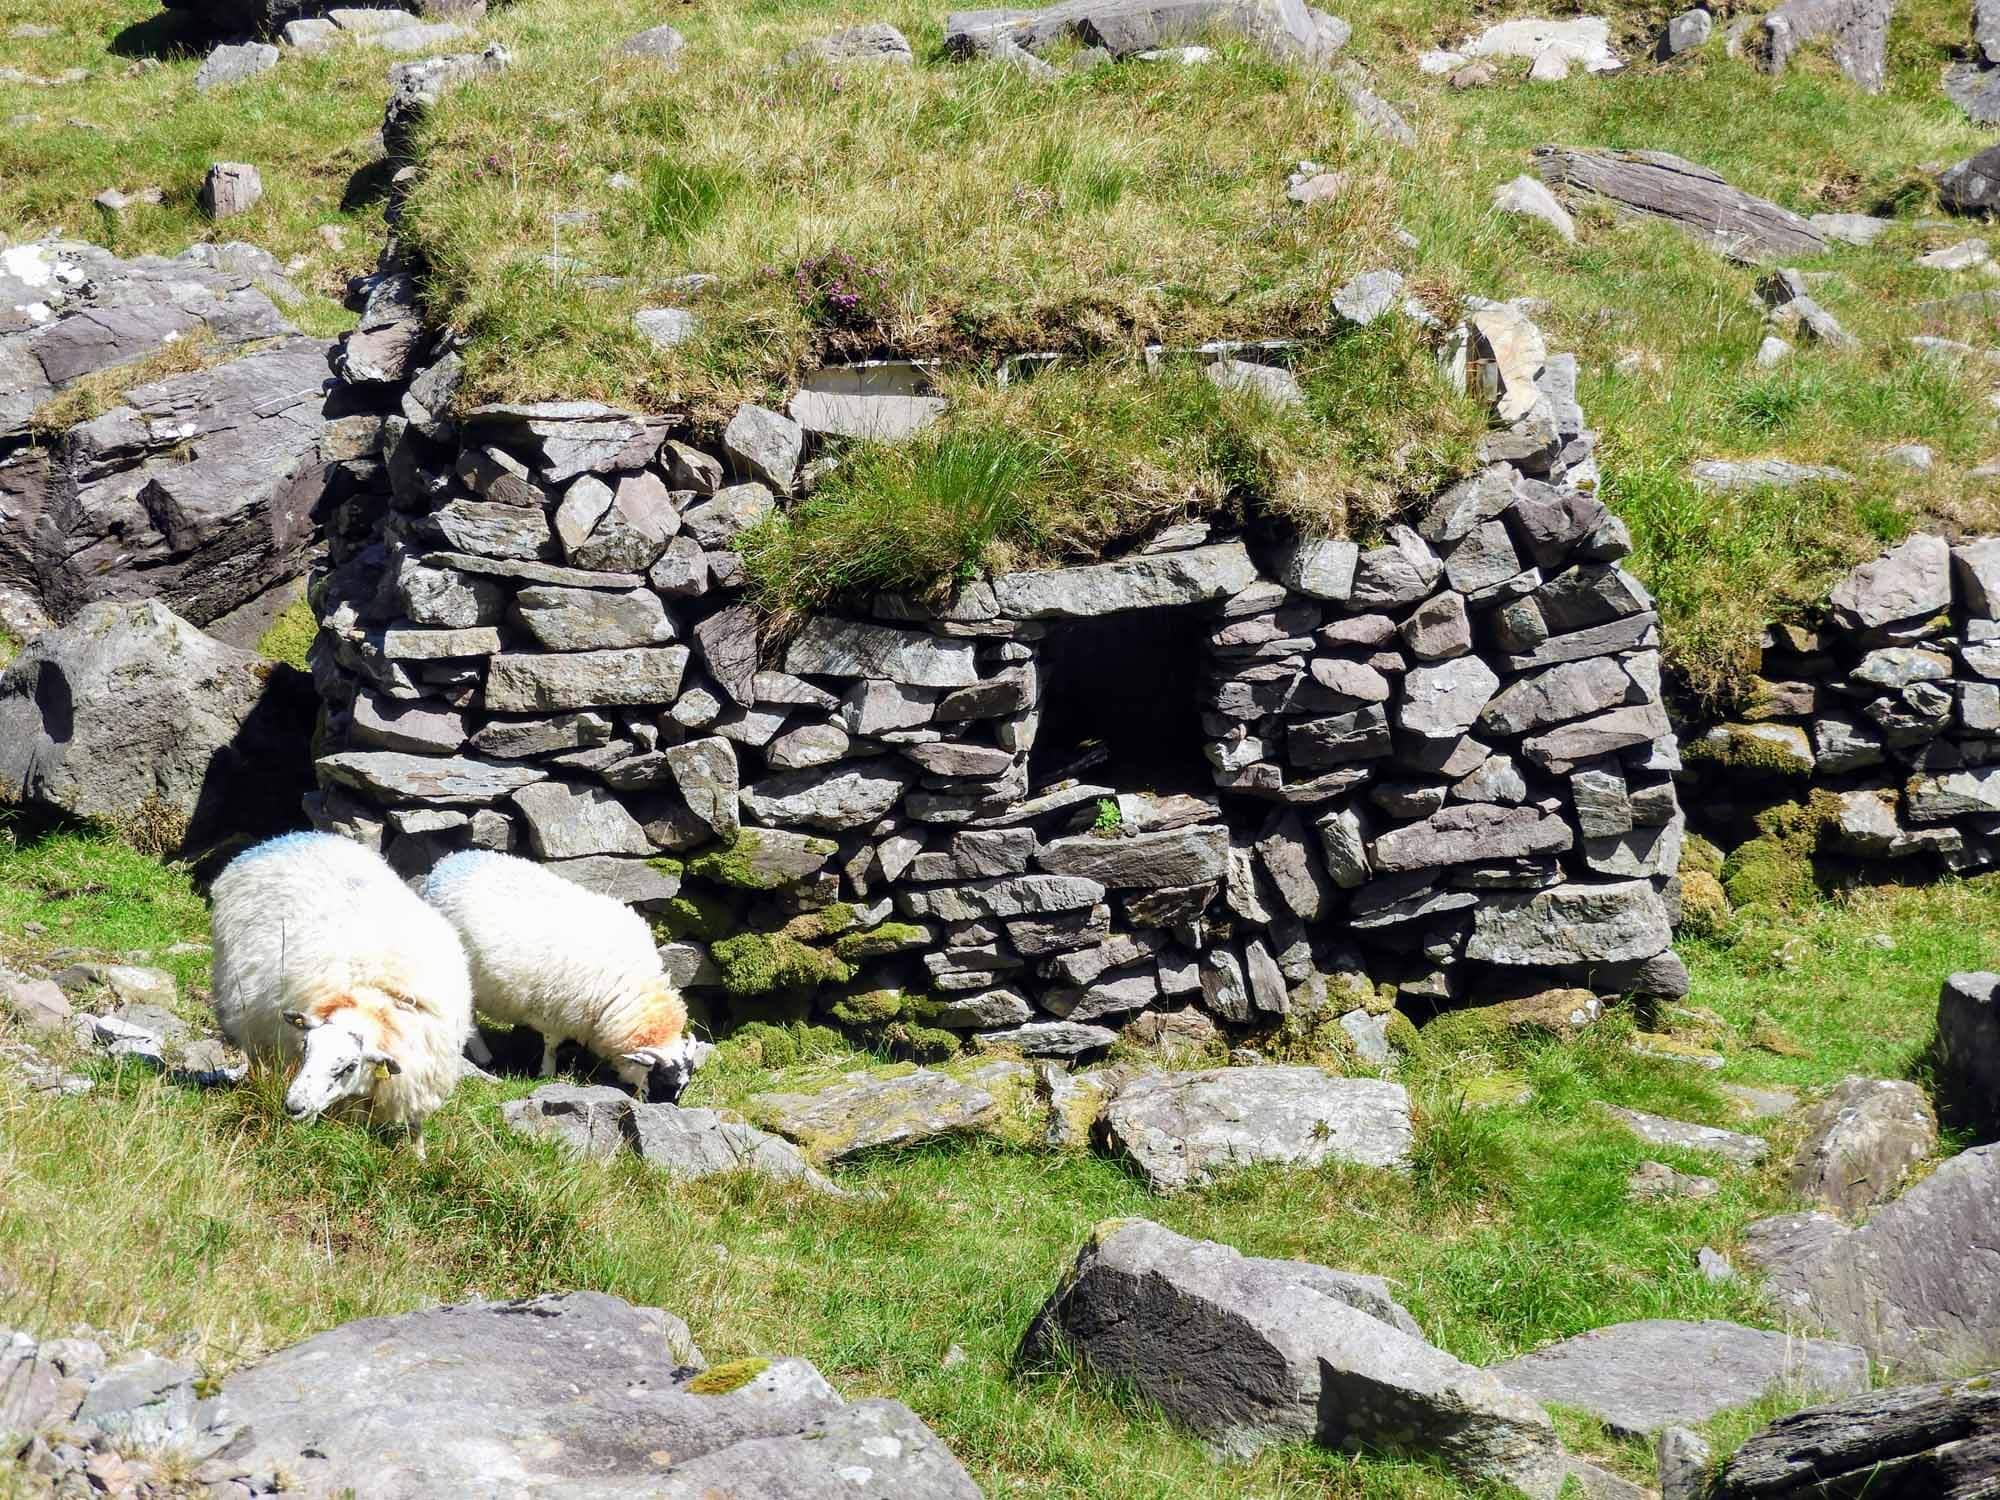 ireland-carrauntoohil-highest-mountain-peak-sheep-stone-ruins.jpg